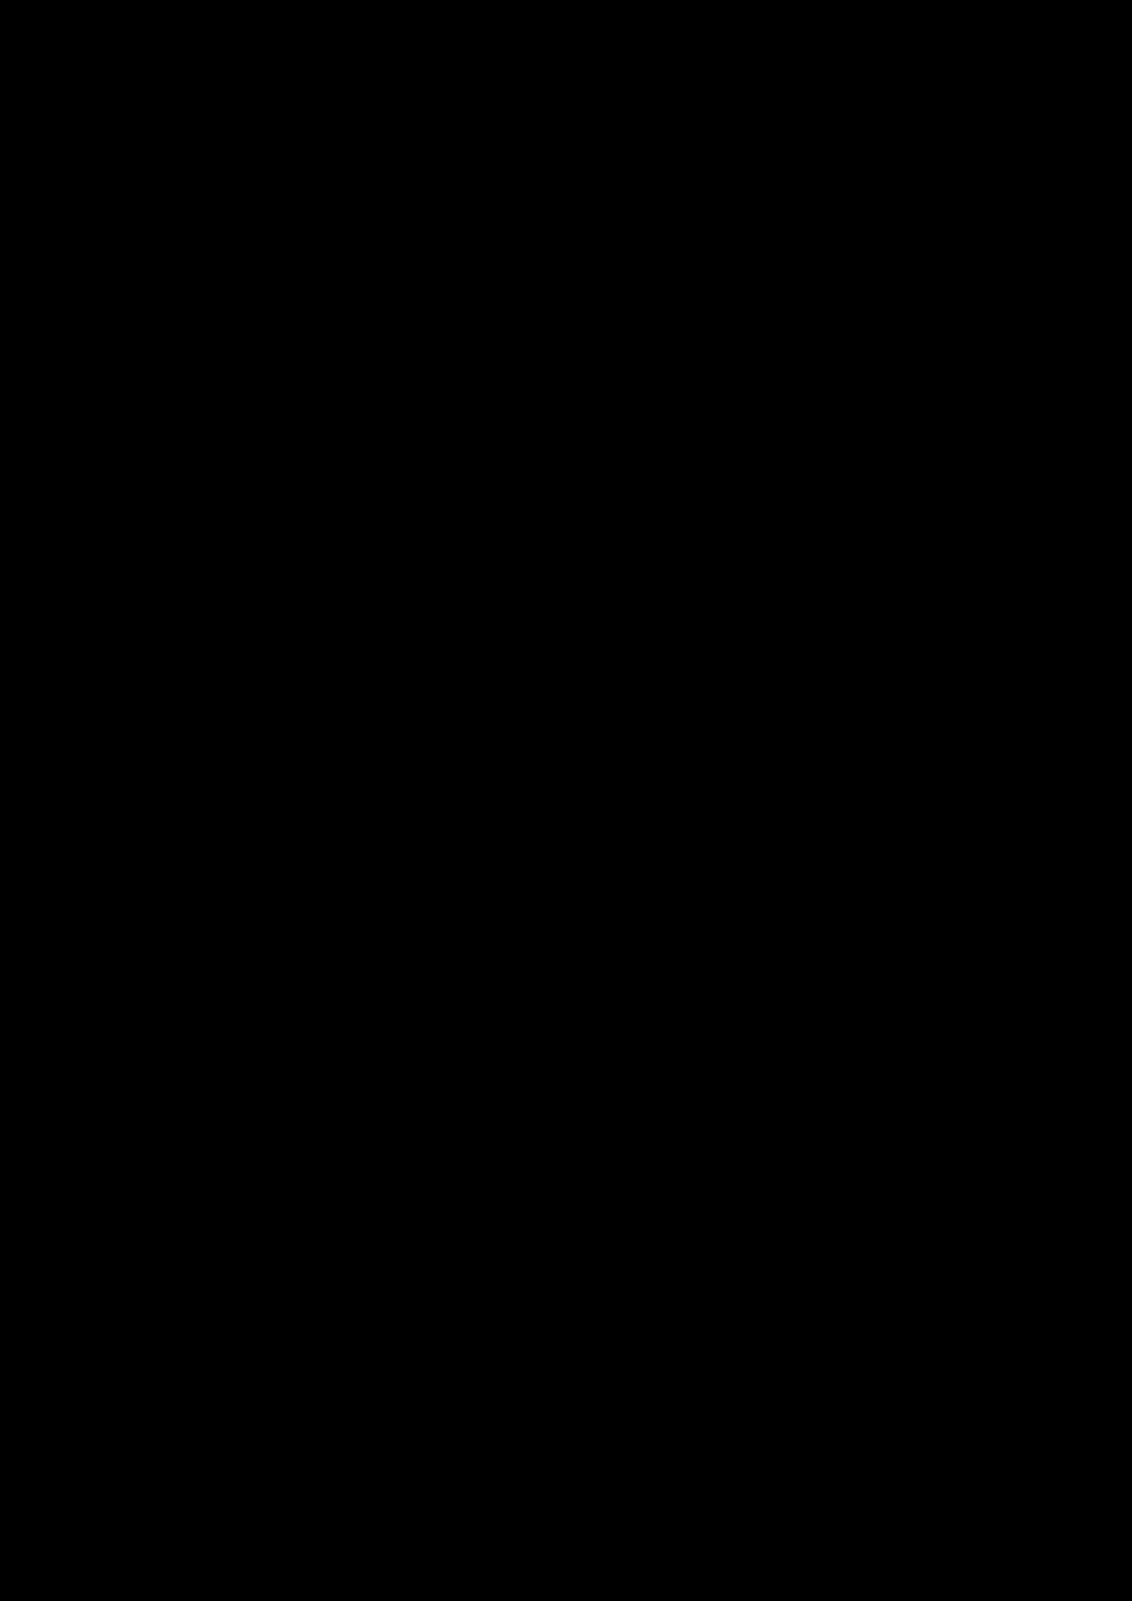 Korolevstvo slez slide, Image 1